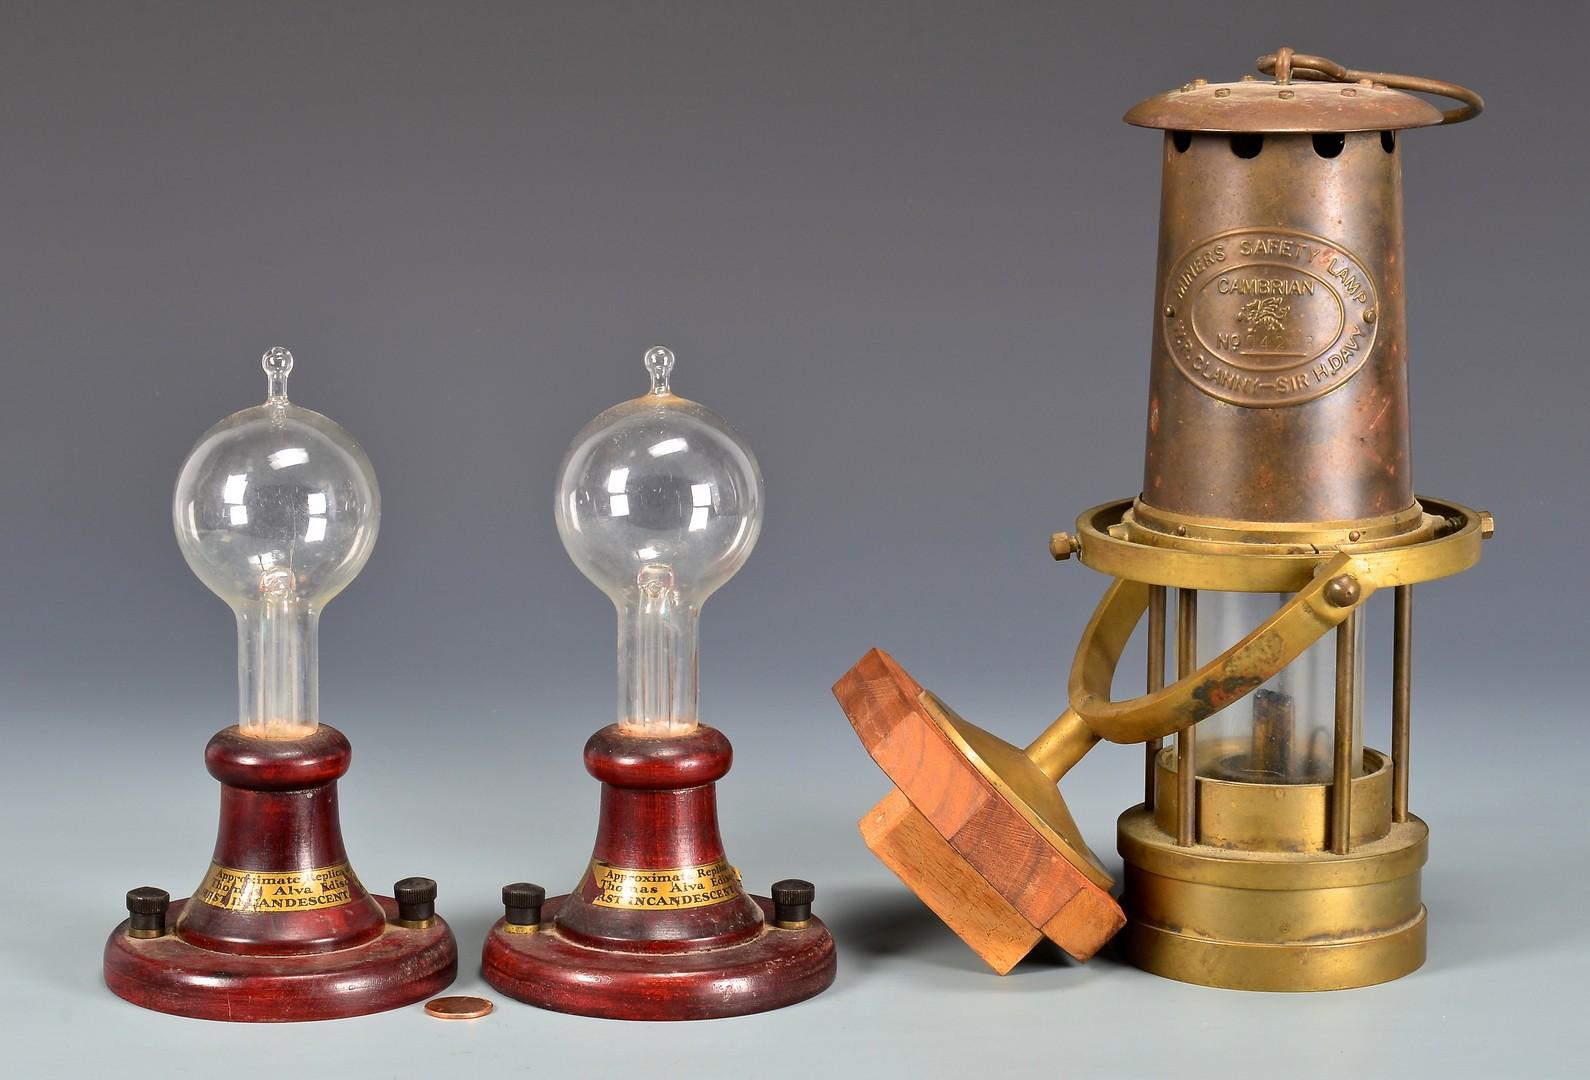 Lot 745: 2 Edison LIght Bulb Lamps, Miner Lamp, Weeden Toy